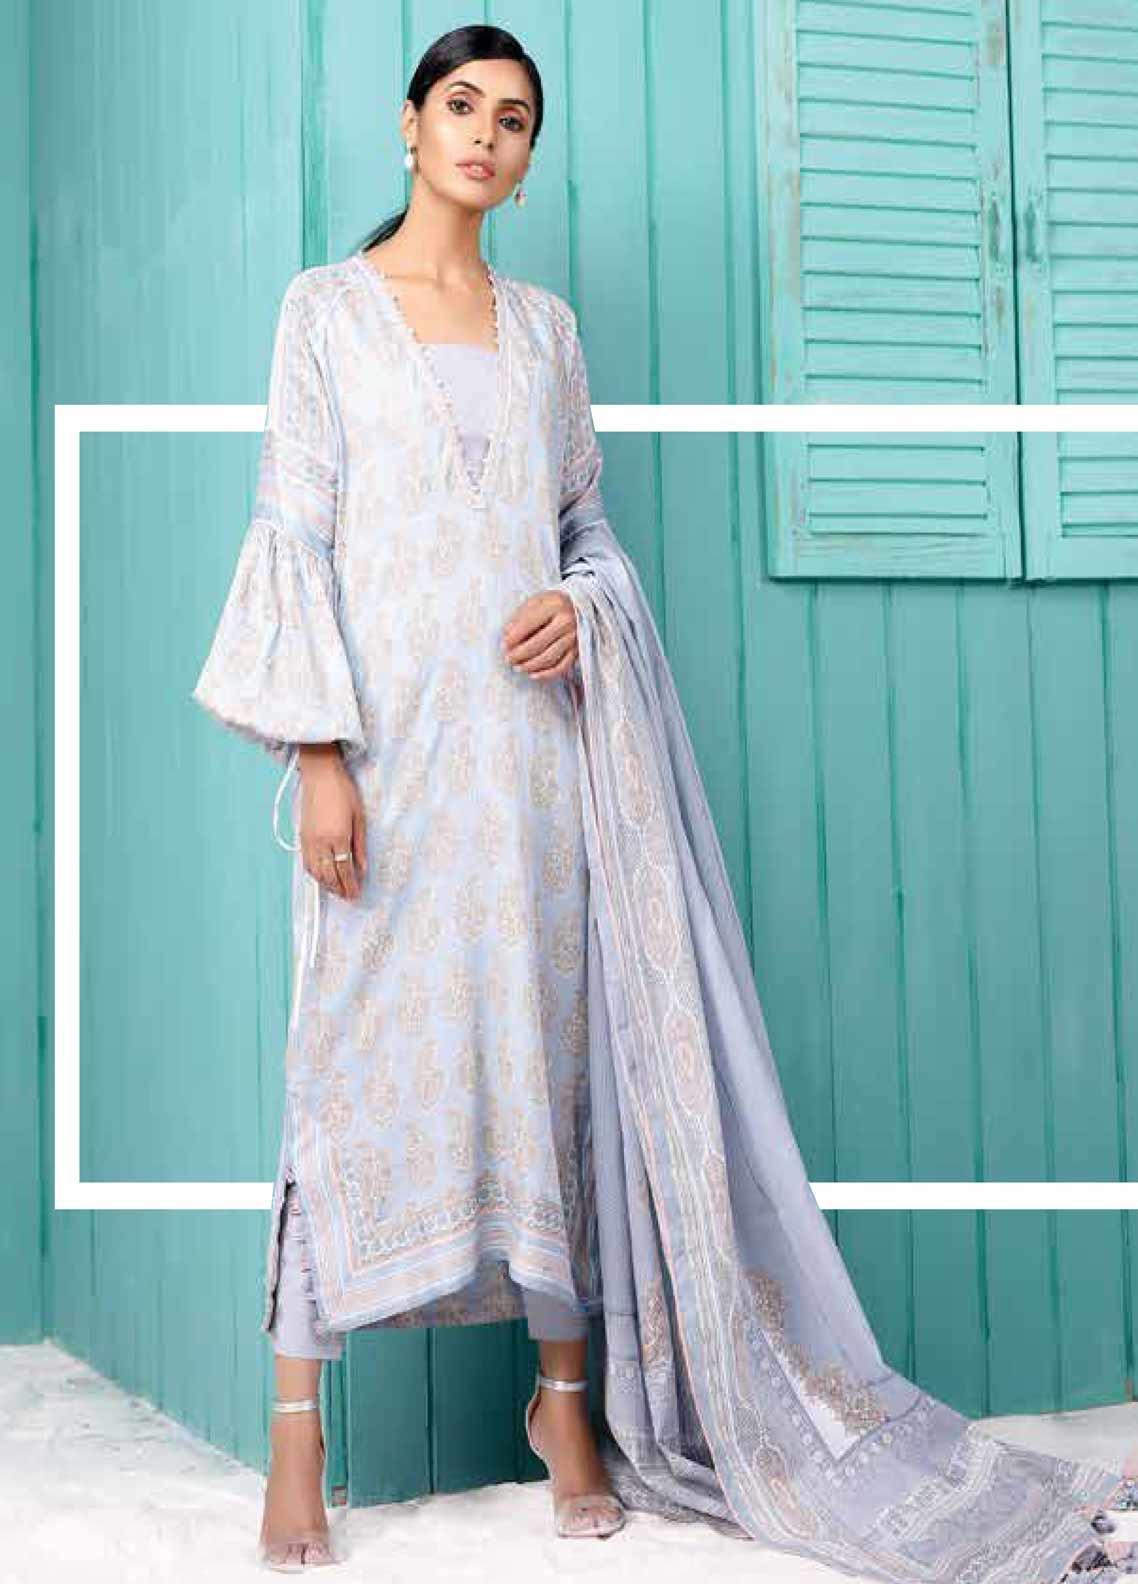 Al Karam Printed Lawn Unstitched 2 Piece Suit AK19-L2 15.1 GREY - Spring / Summer Collection